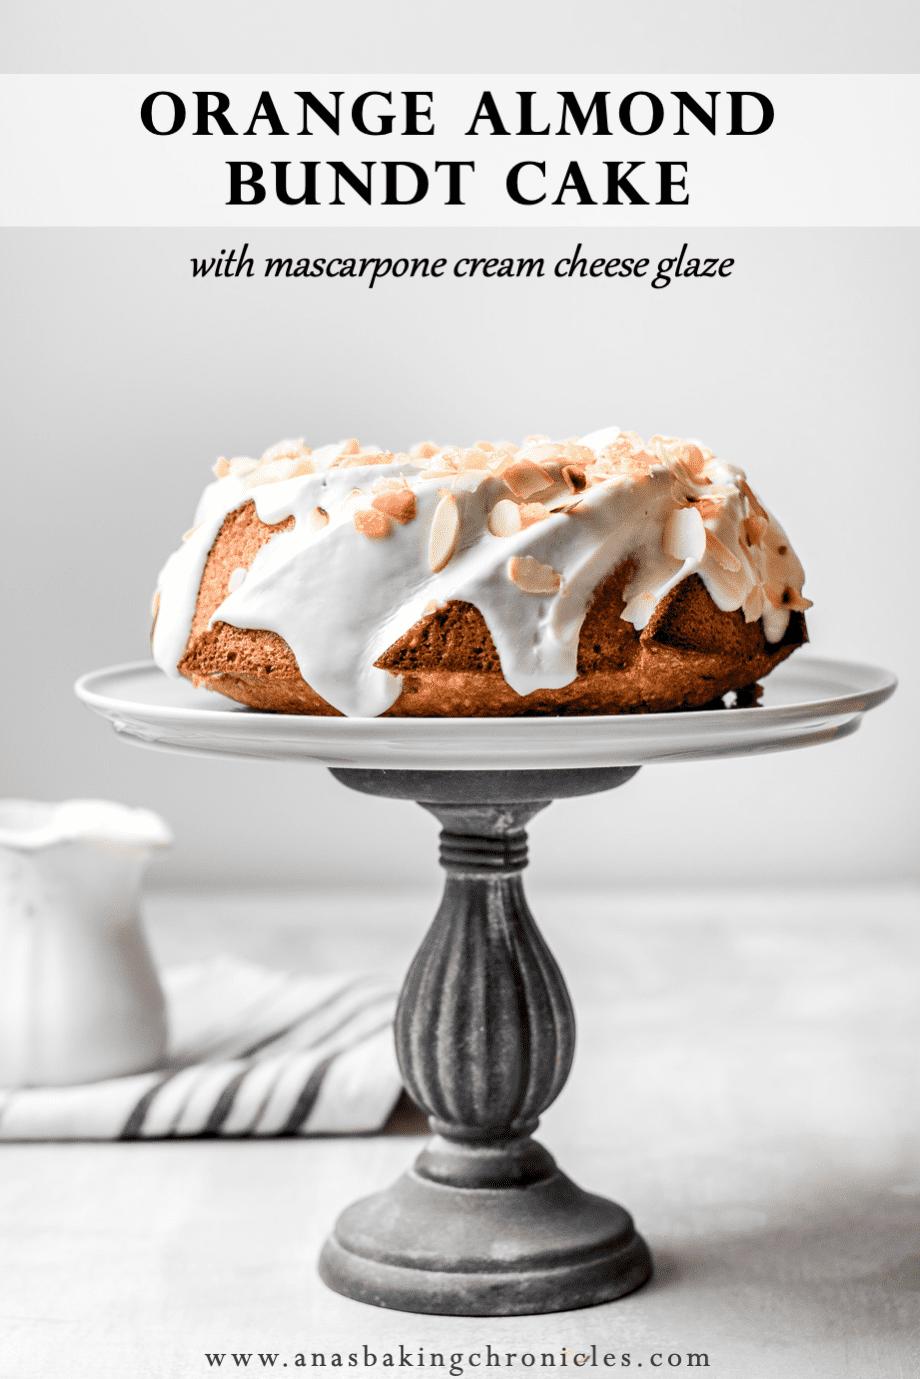 Orange Almond Bundt Cake with Mascarpone Cream Cheese glaze